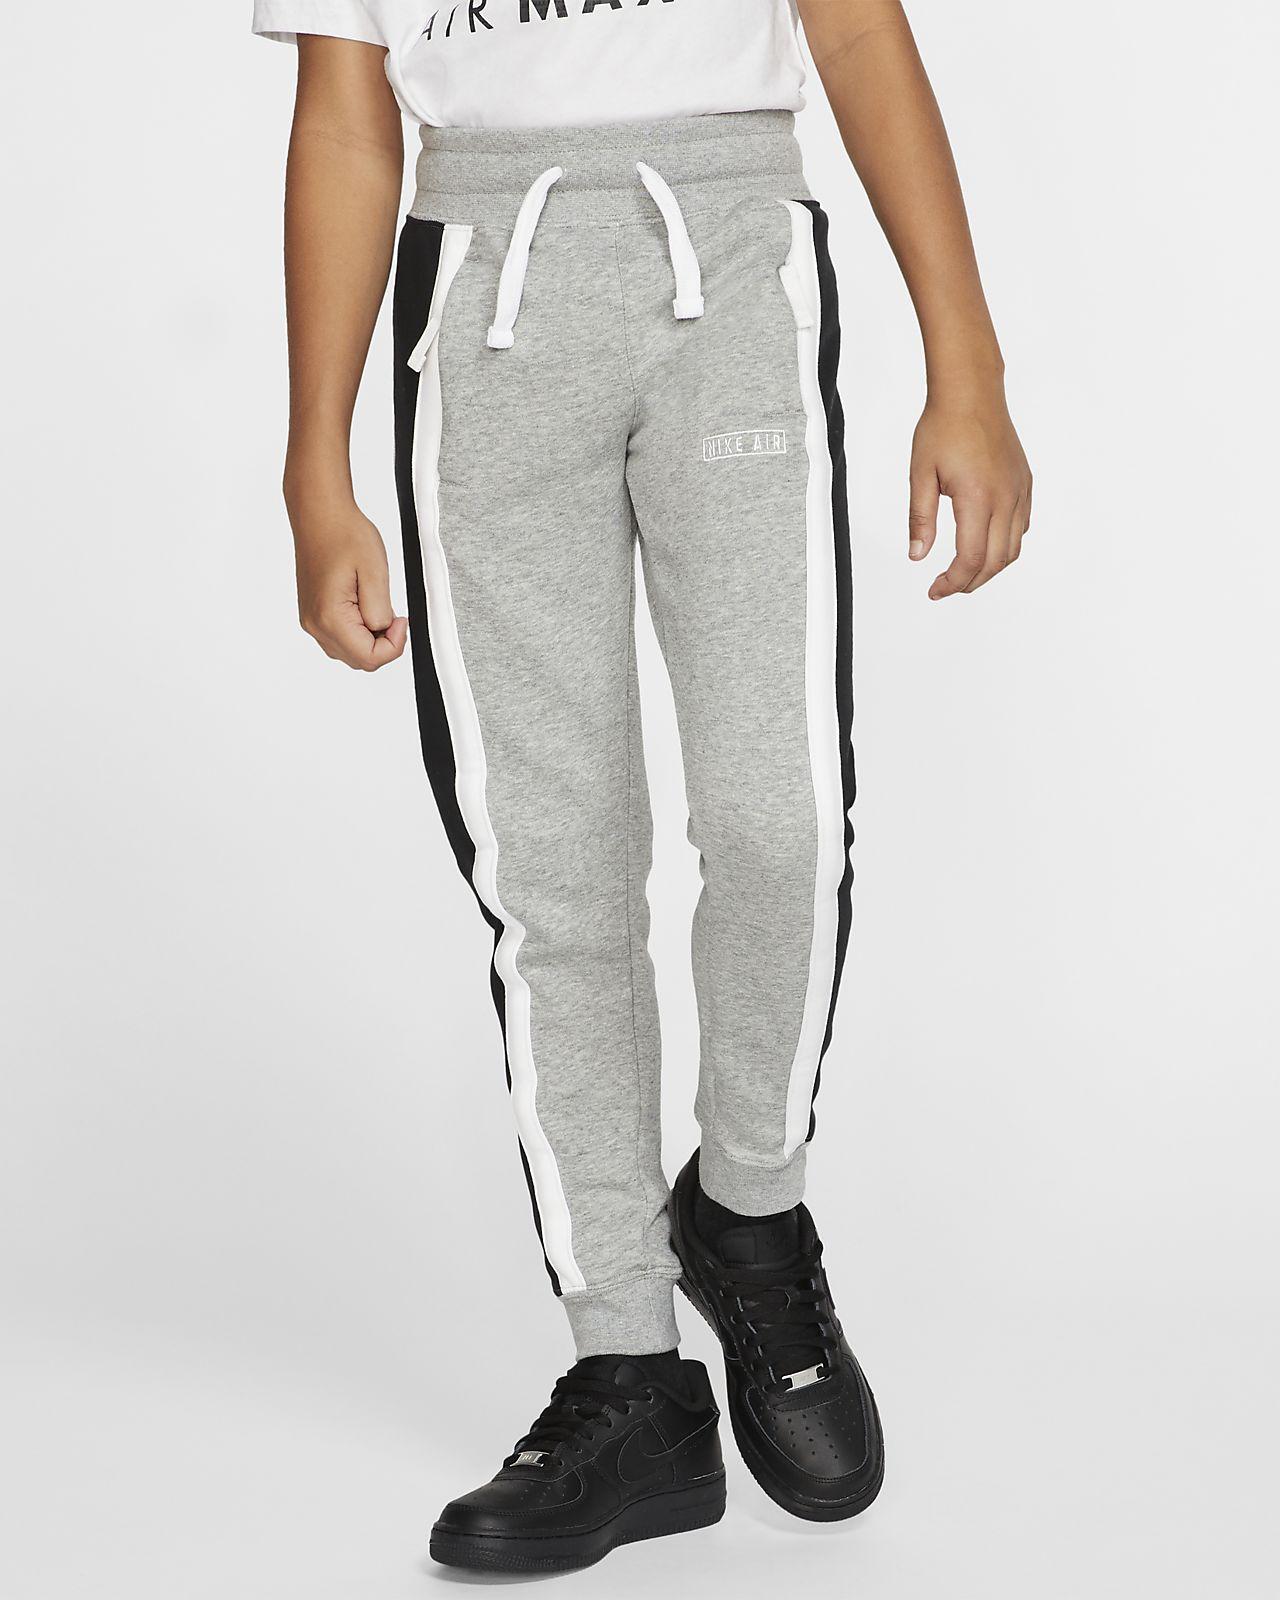 Pantalon Nike Air pour Garçon plus âgé